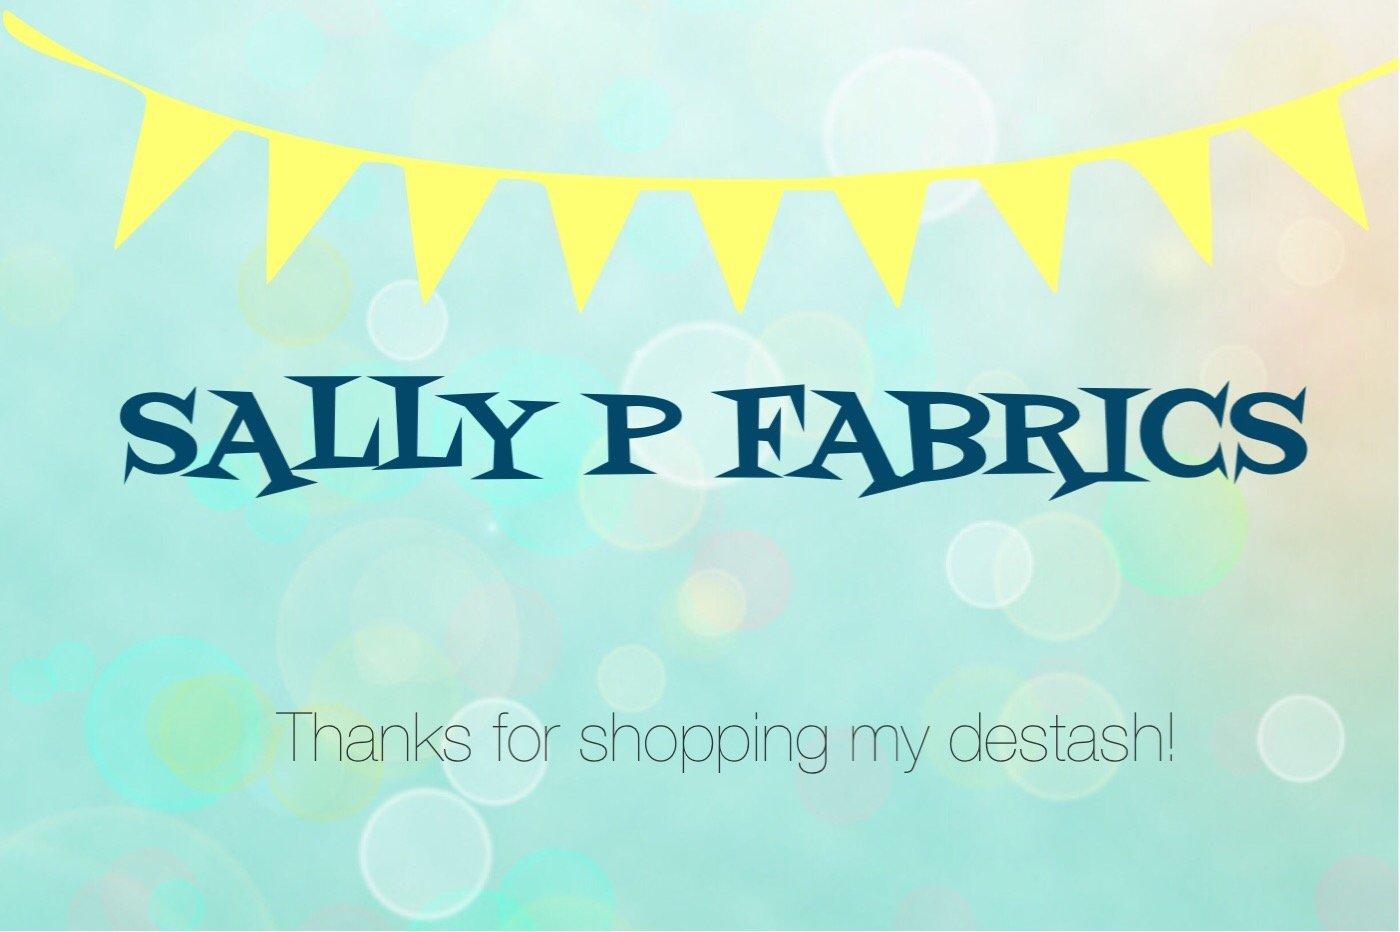 SallyP Fabrics